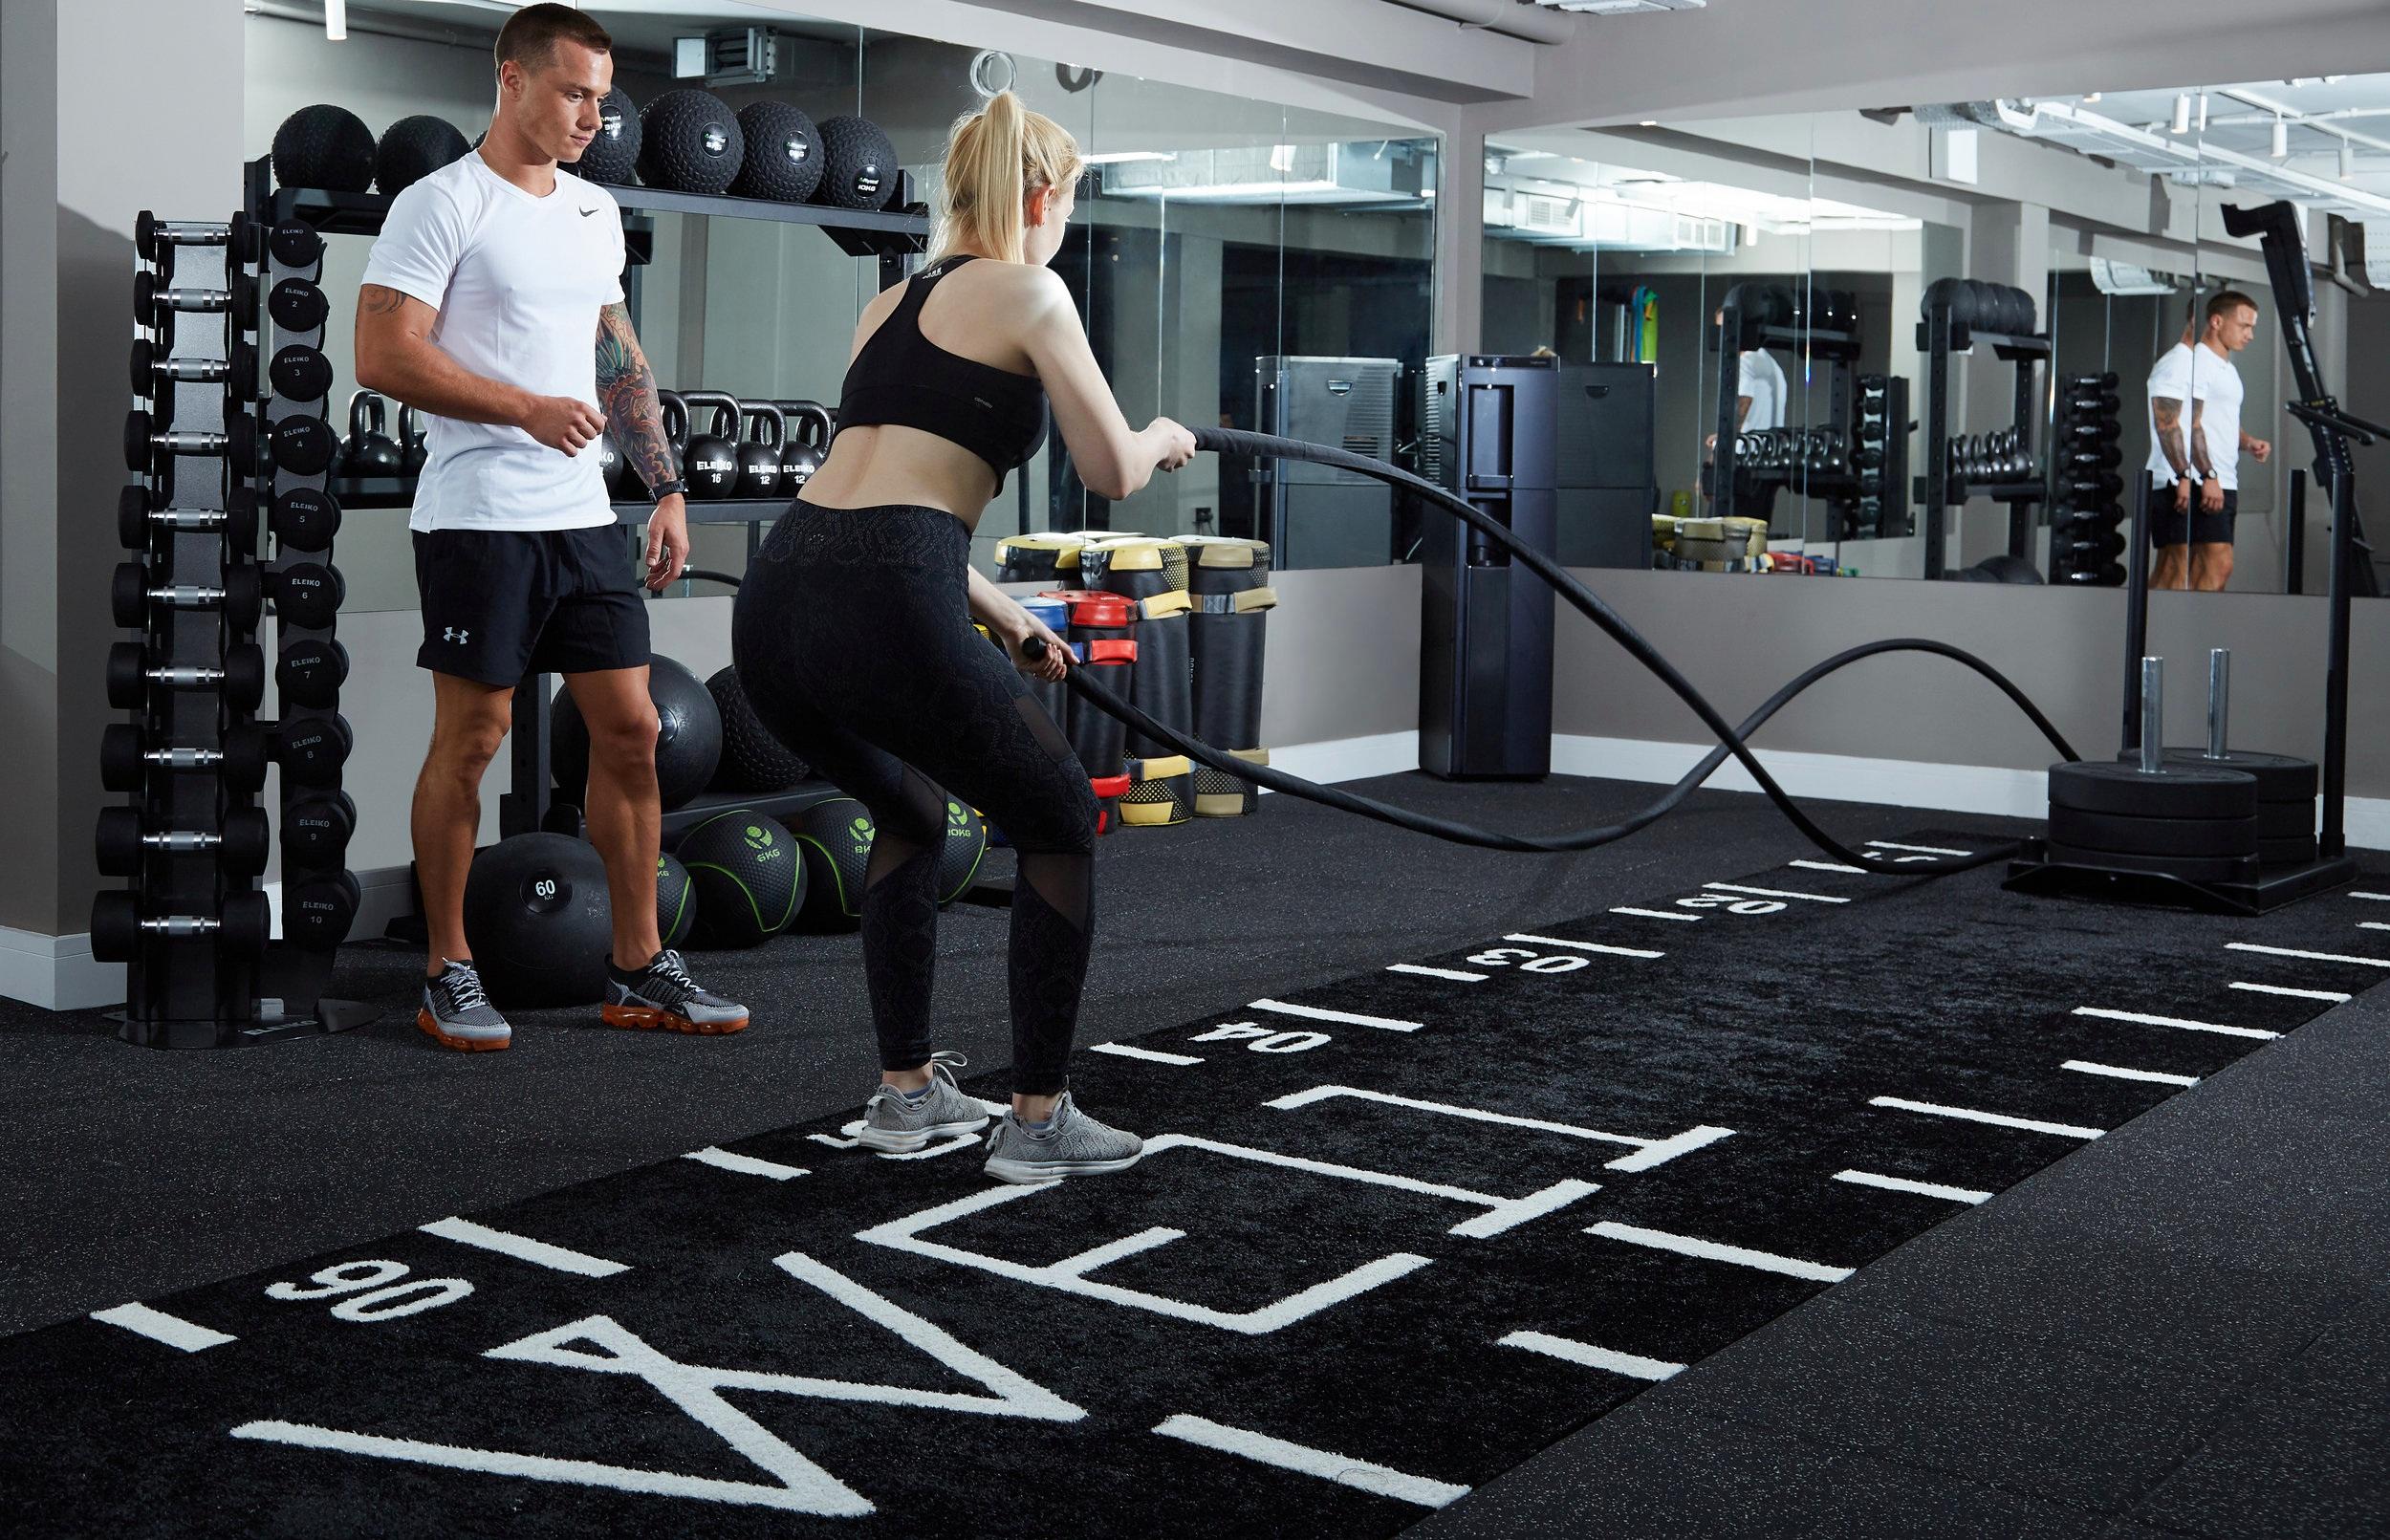 gym_session2139.jpg